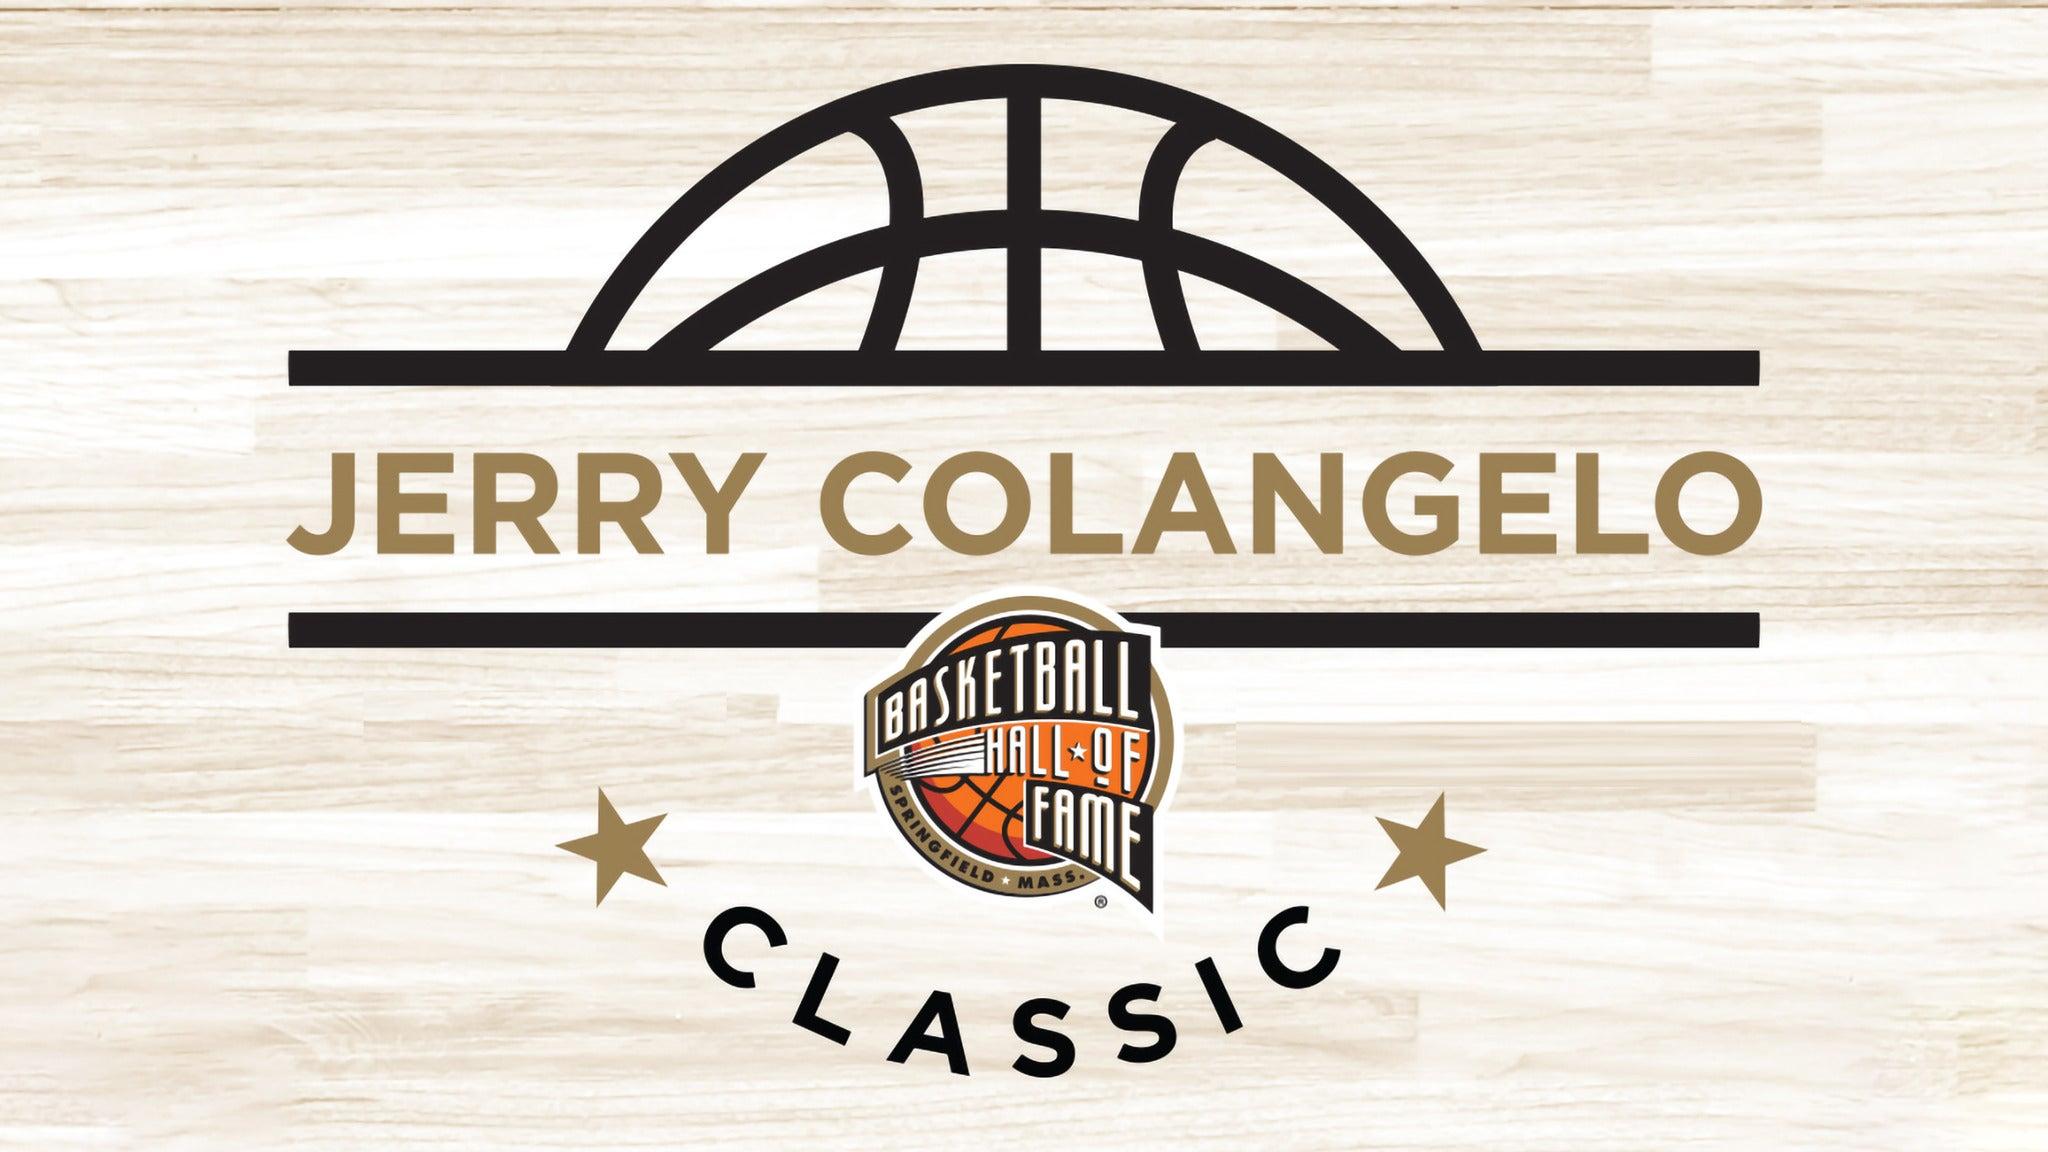 Jerry Colangelo Classic at Footprint Center - Phoenix, AZ 85004